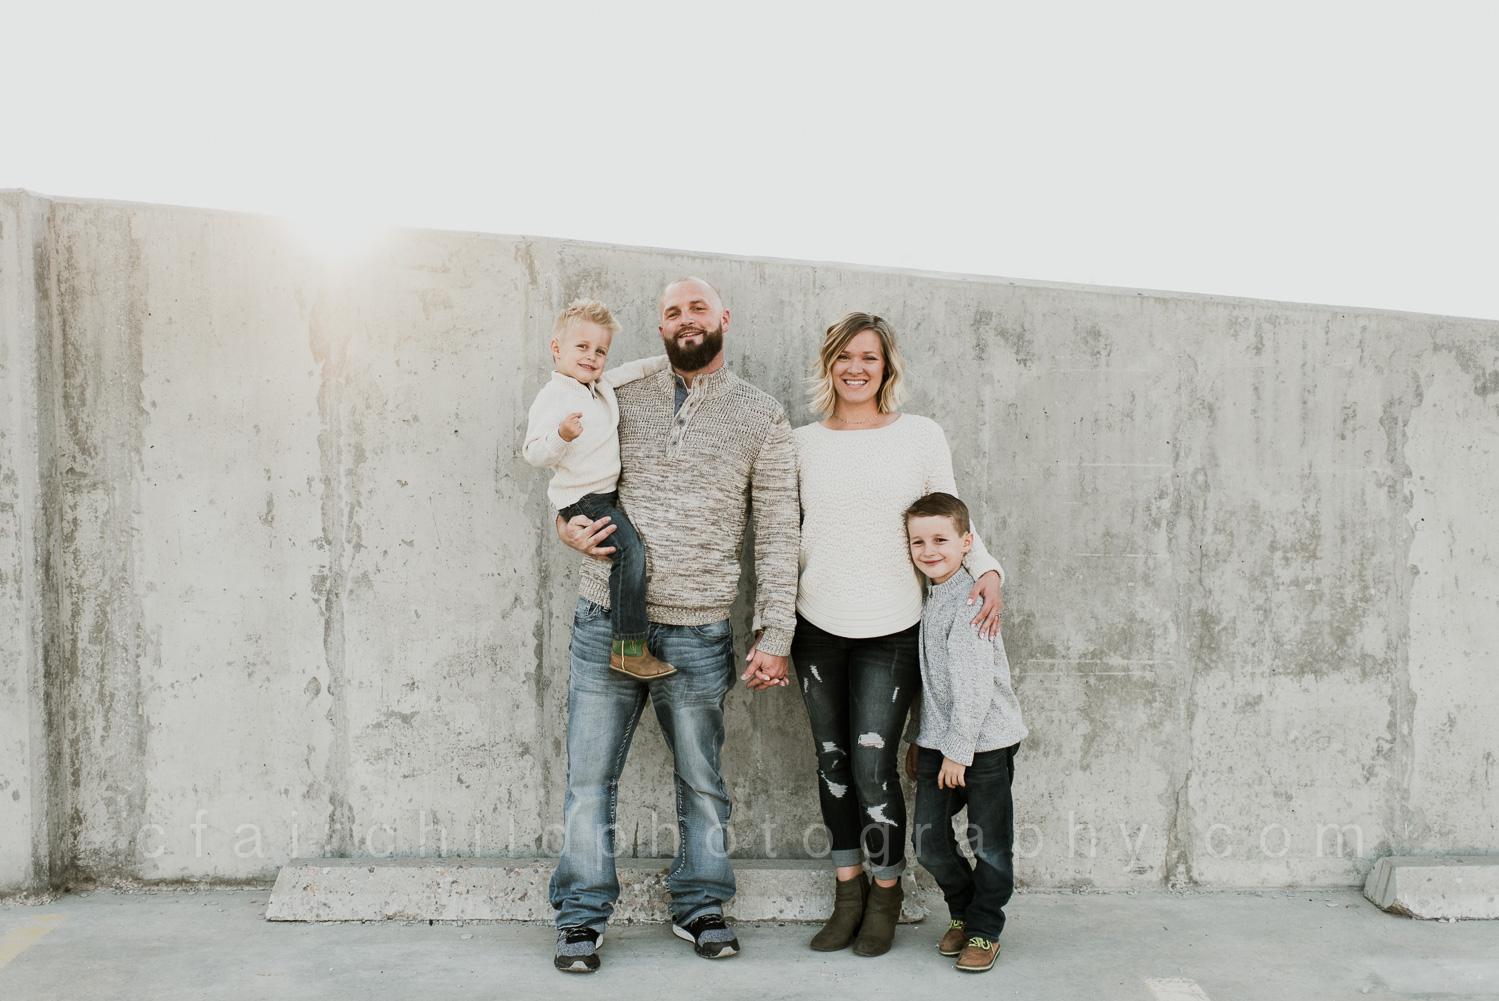 urban-family-photo-cfairchild4.jpg